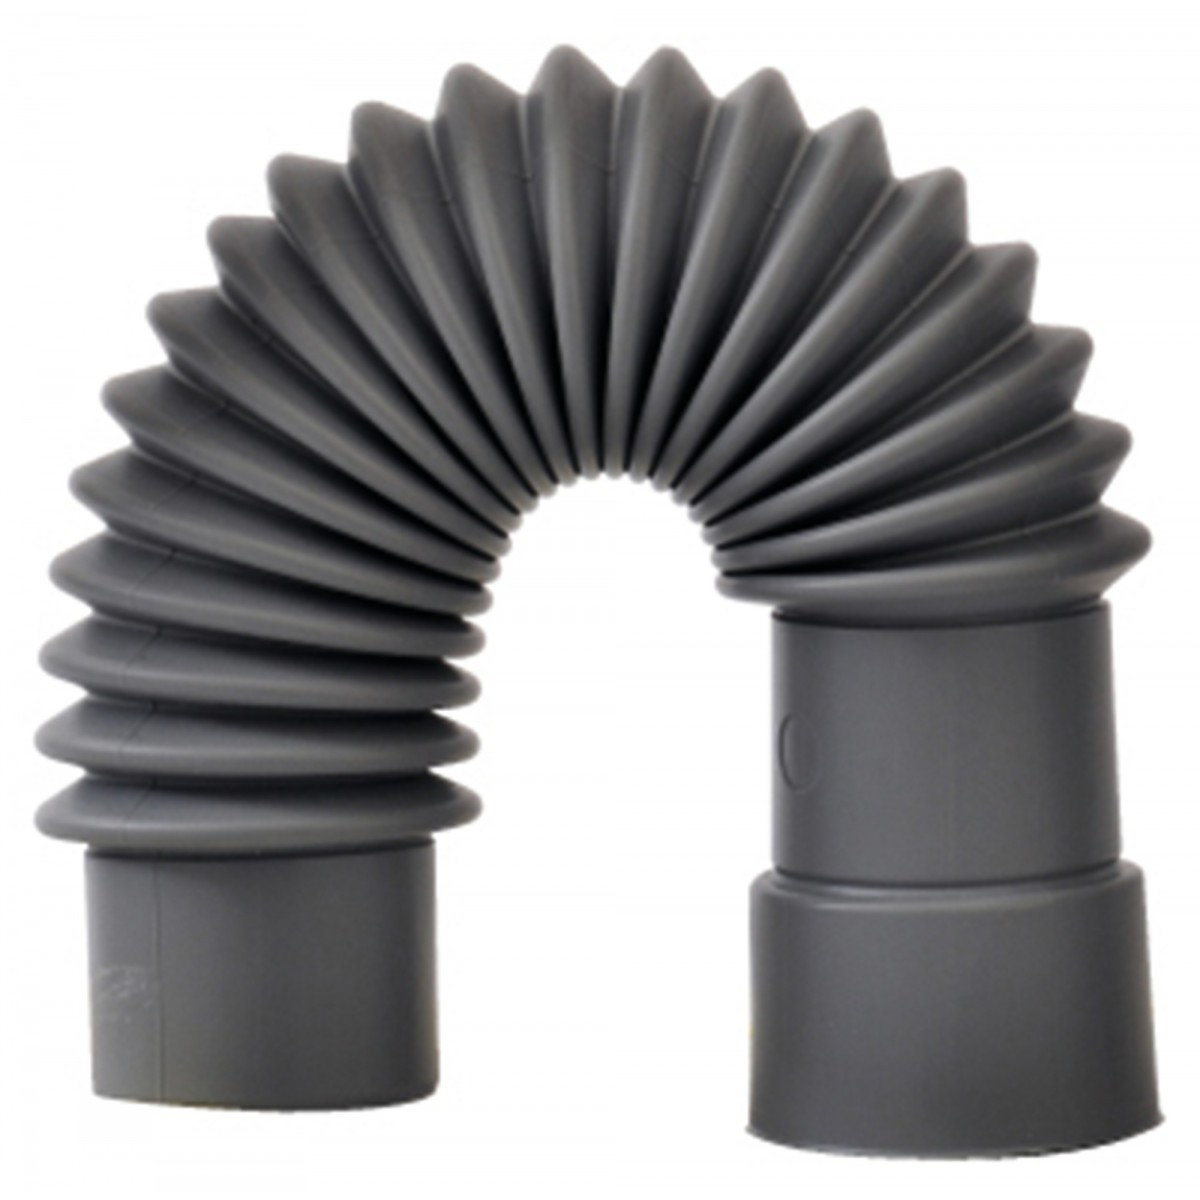 Manchette flexible universelle Coudix Girpi - Diamètre 40 mm